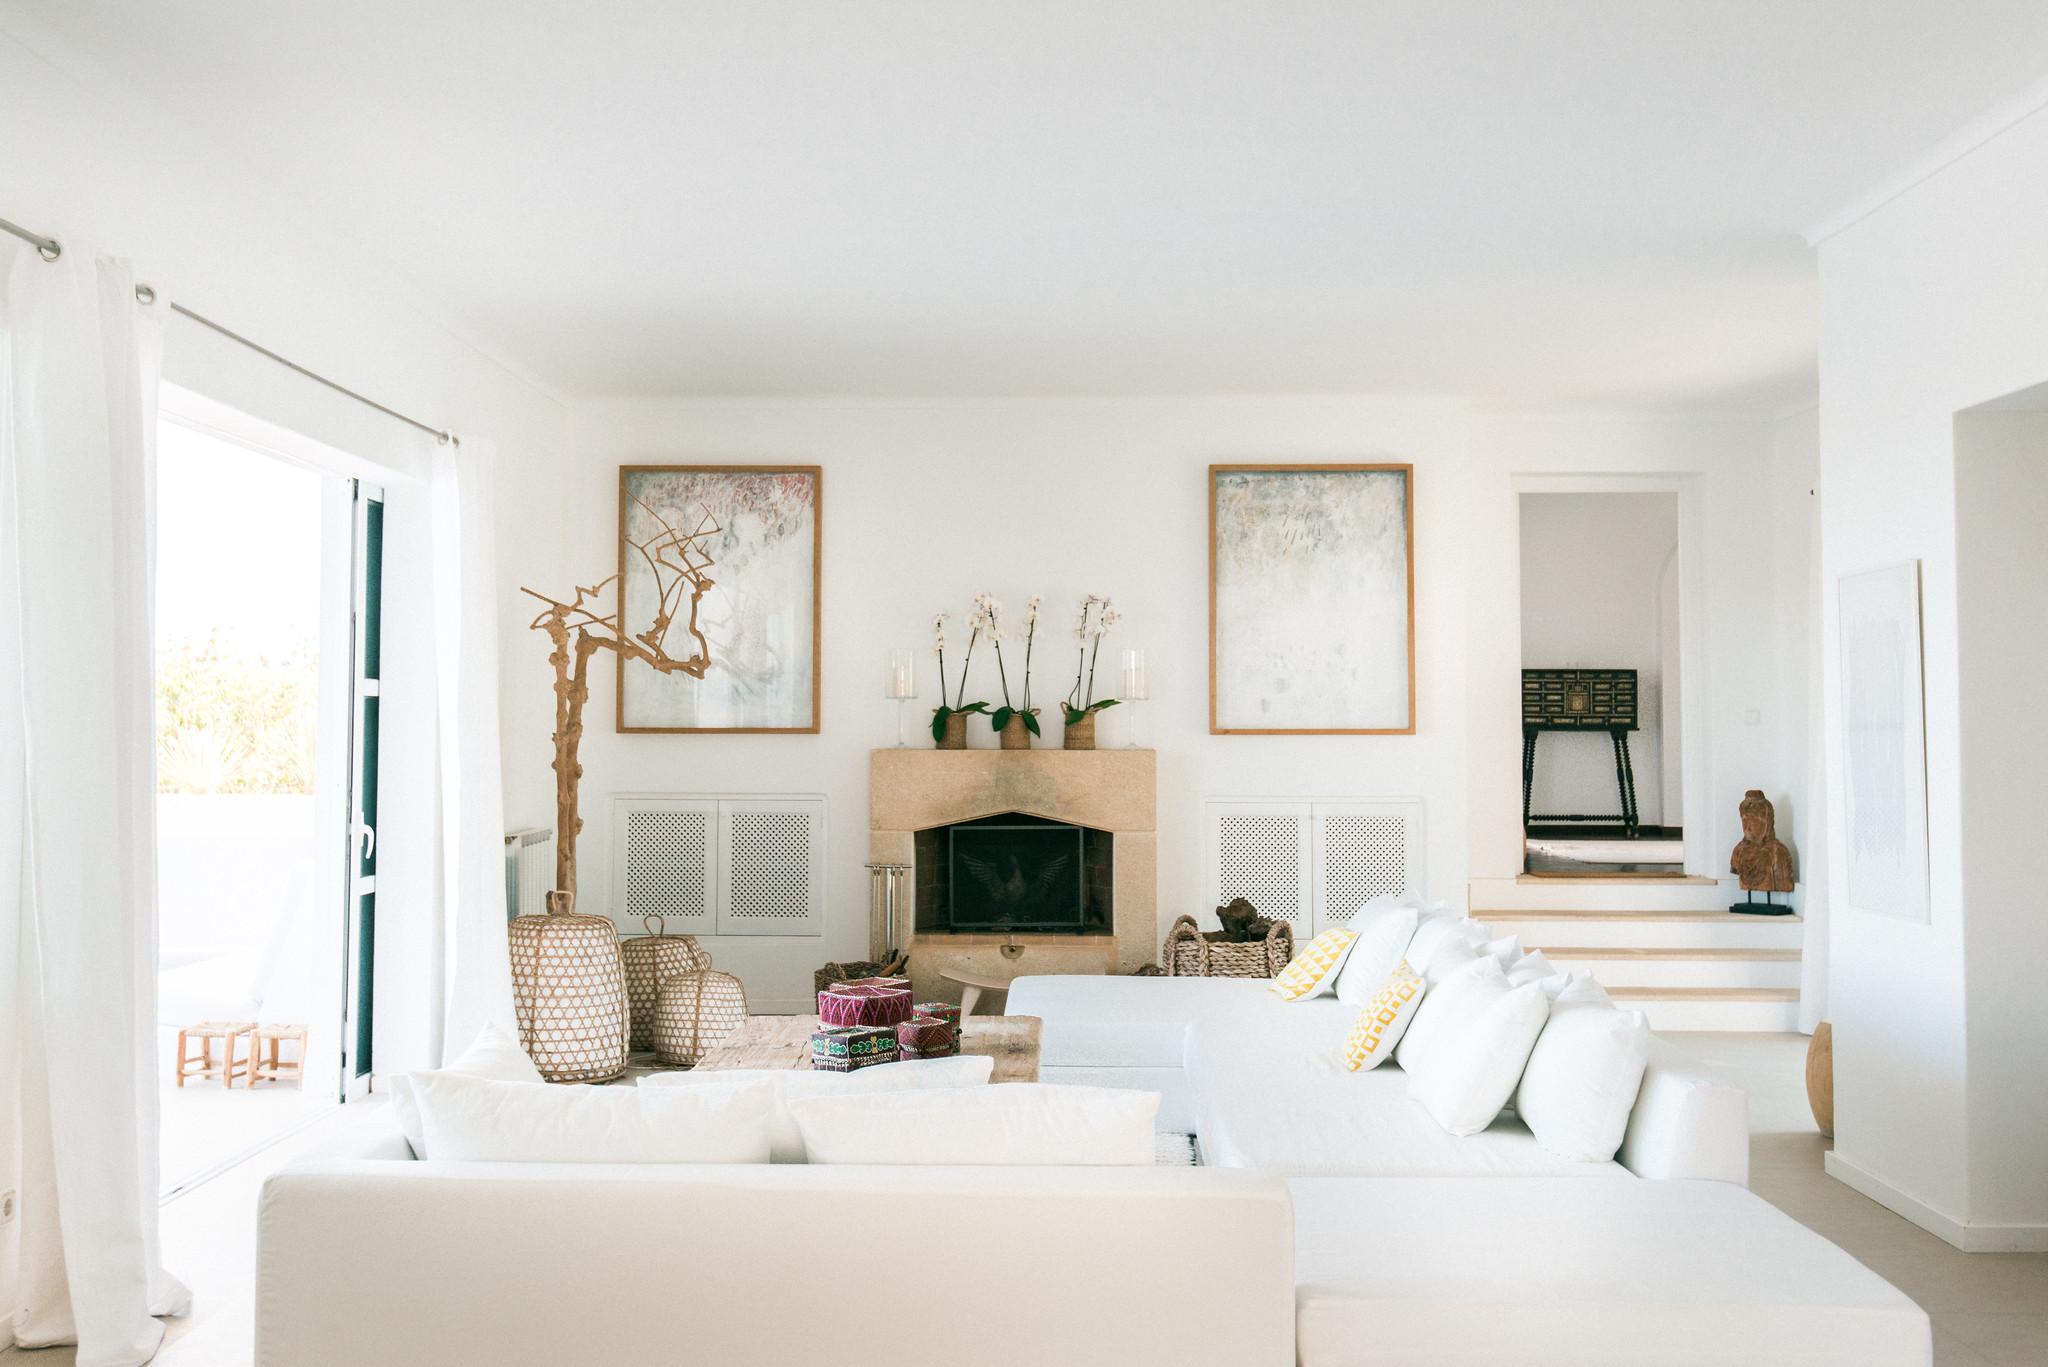 https://www.white-ibiza.com/wp-content/uploads/2020/06/white-ibiza-villas-casa-odette-interior-living-room.jpg